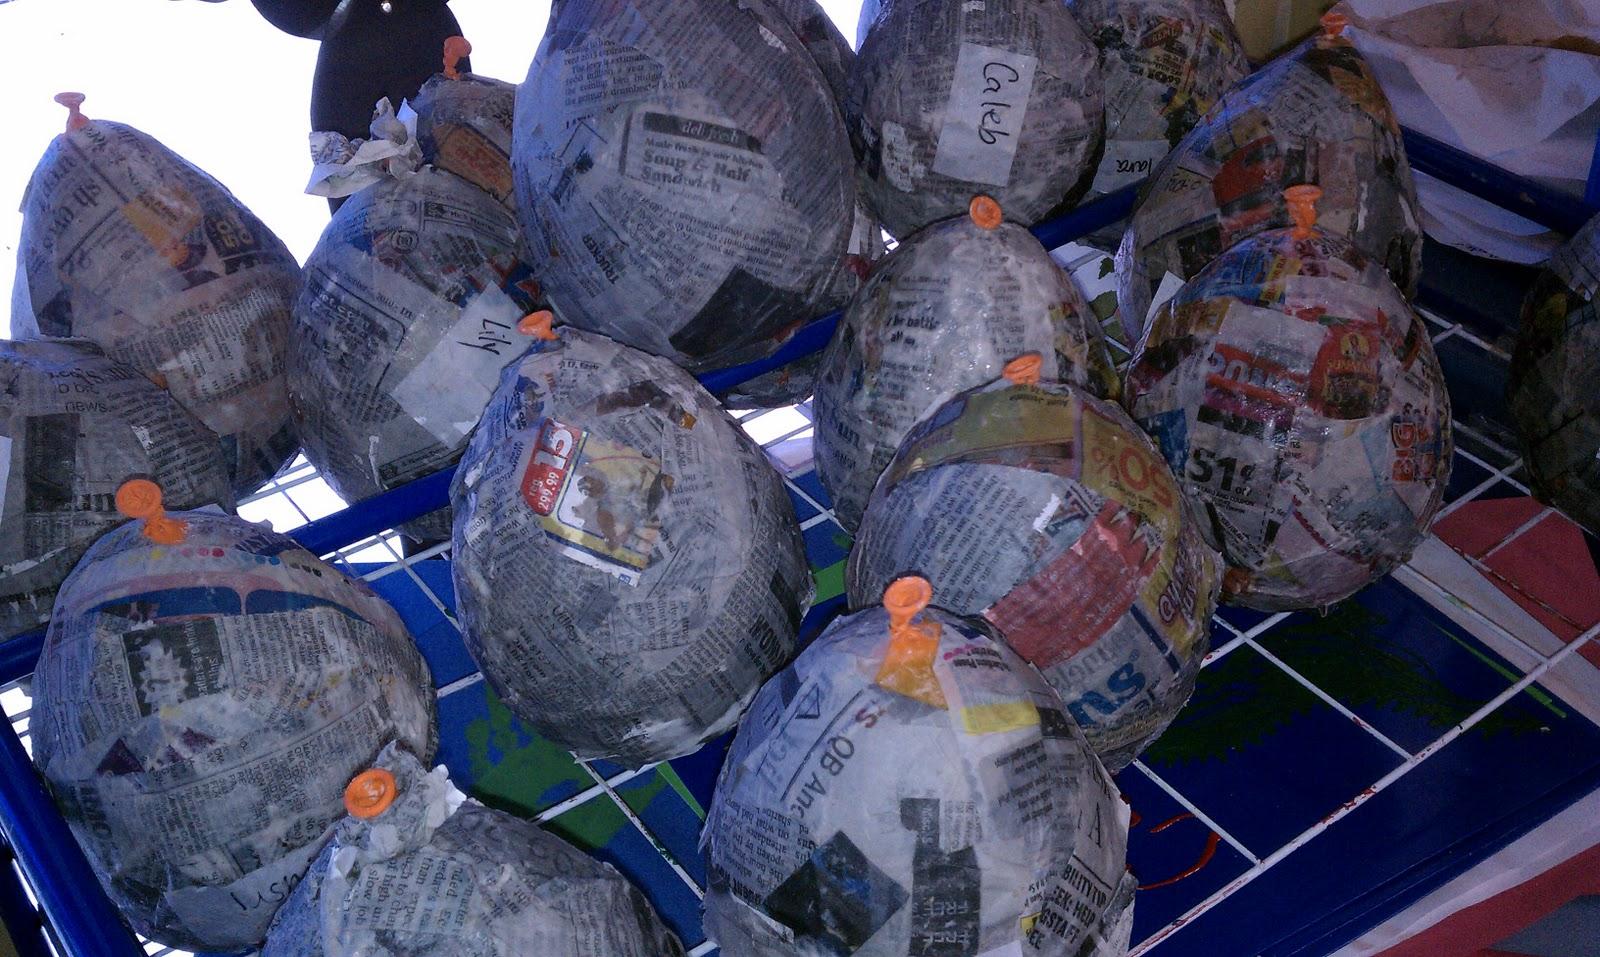 Preschool Art And Crafts Paper Mache Jack O Lanterns